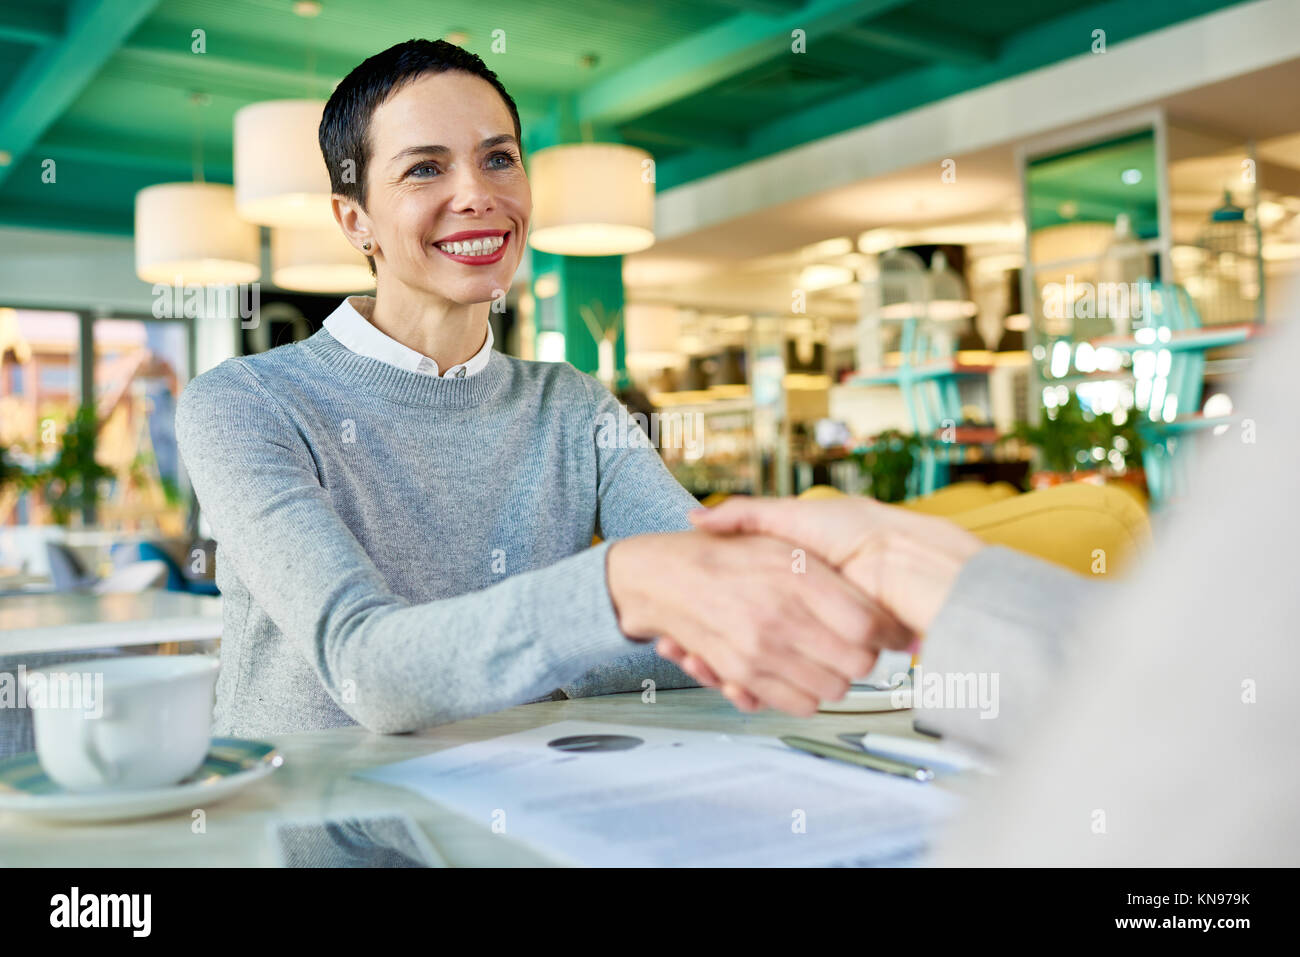 Un apretón de manos de empresarias en Cafe reunión Imagen De Stock